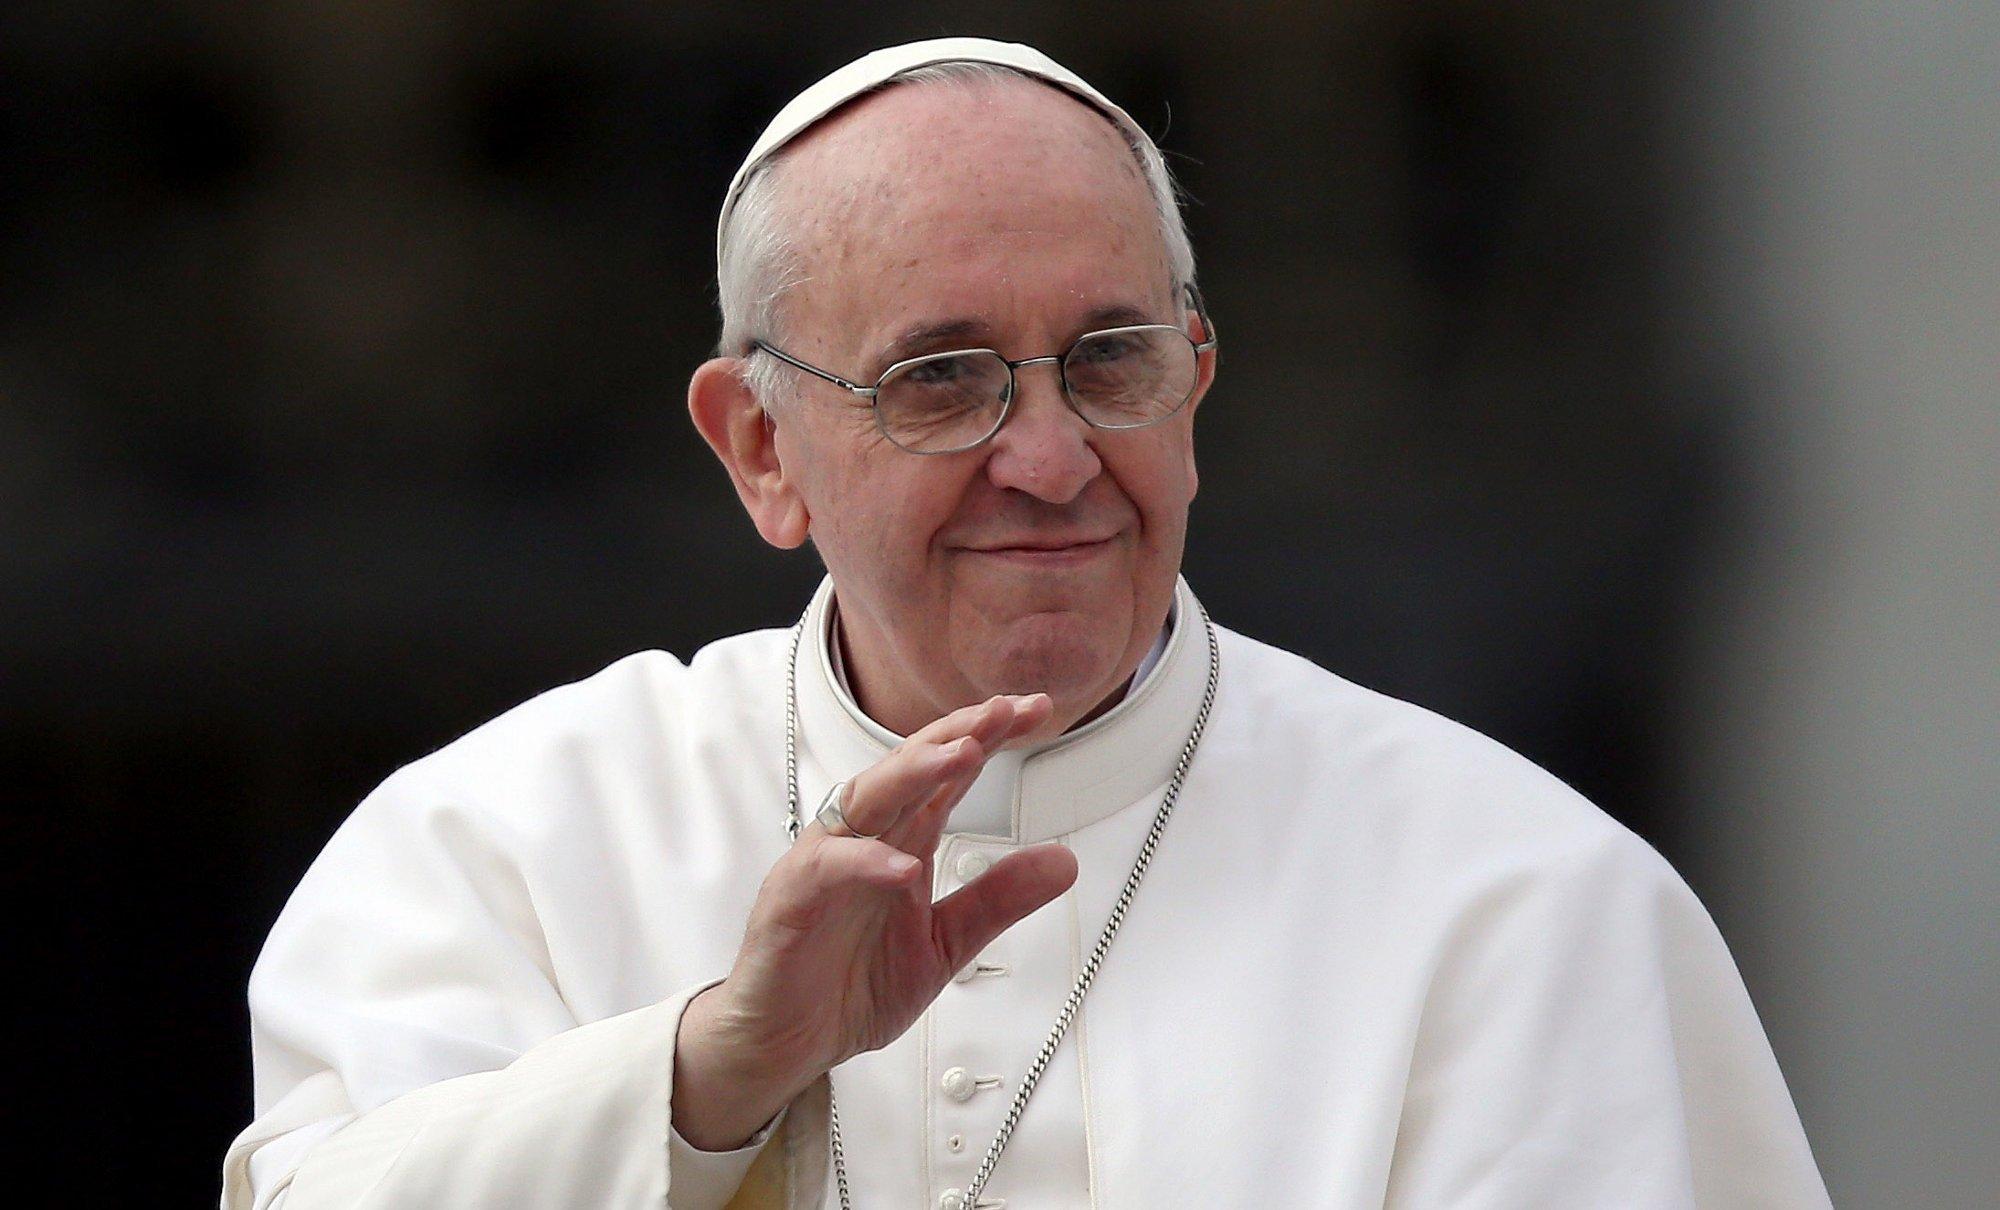 Premoniciones de La Púrpura Negra sobre el Papa Francisco